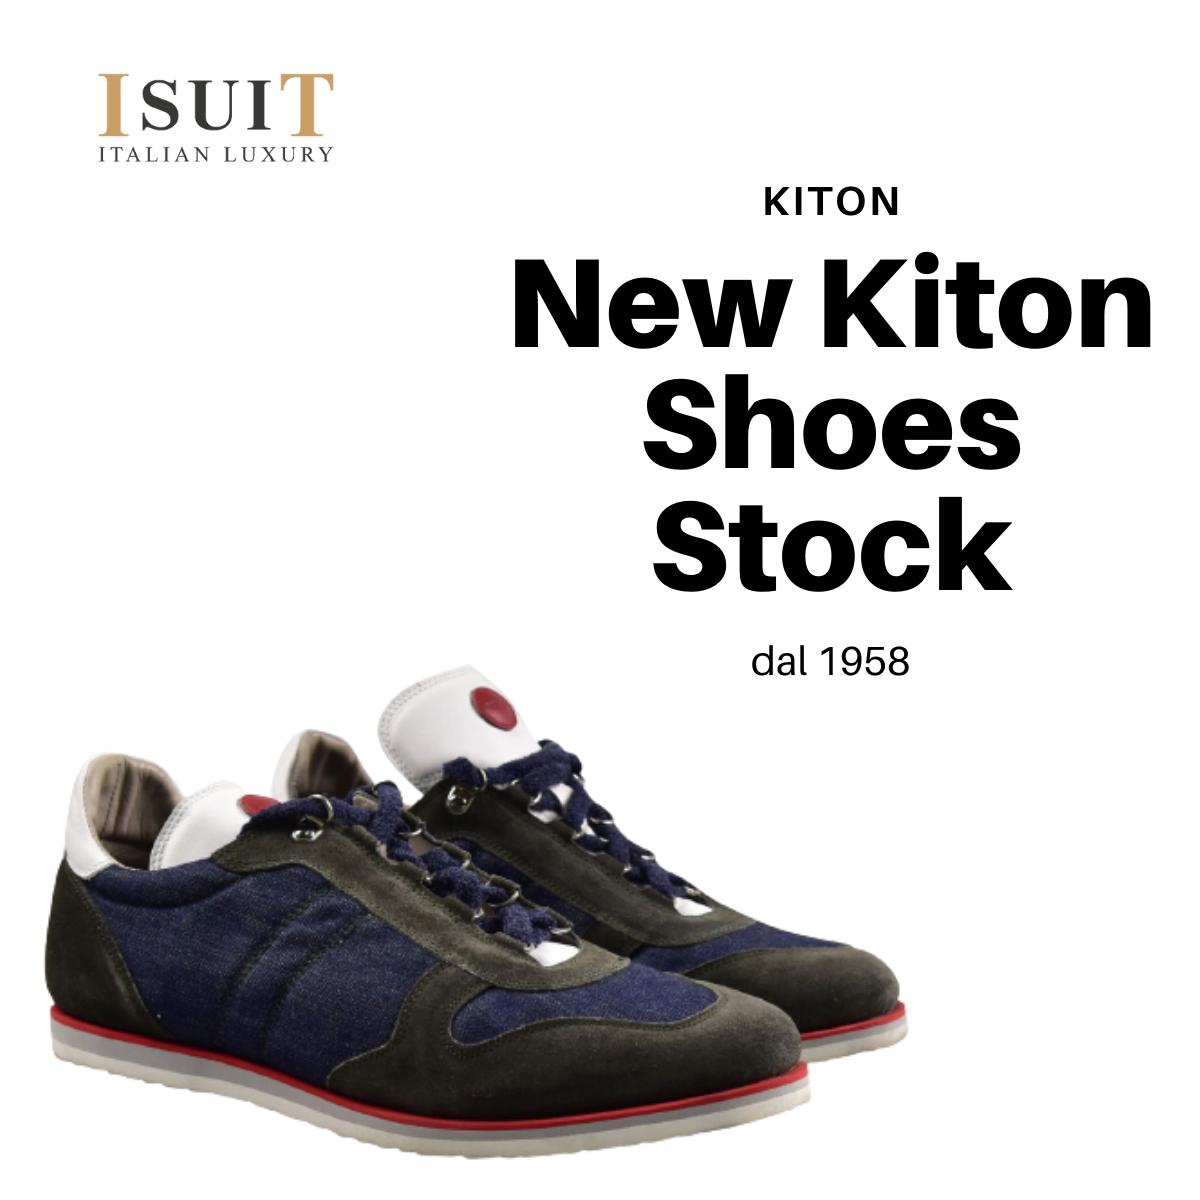 New Kiton Shoe Stock.png